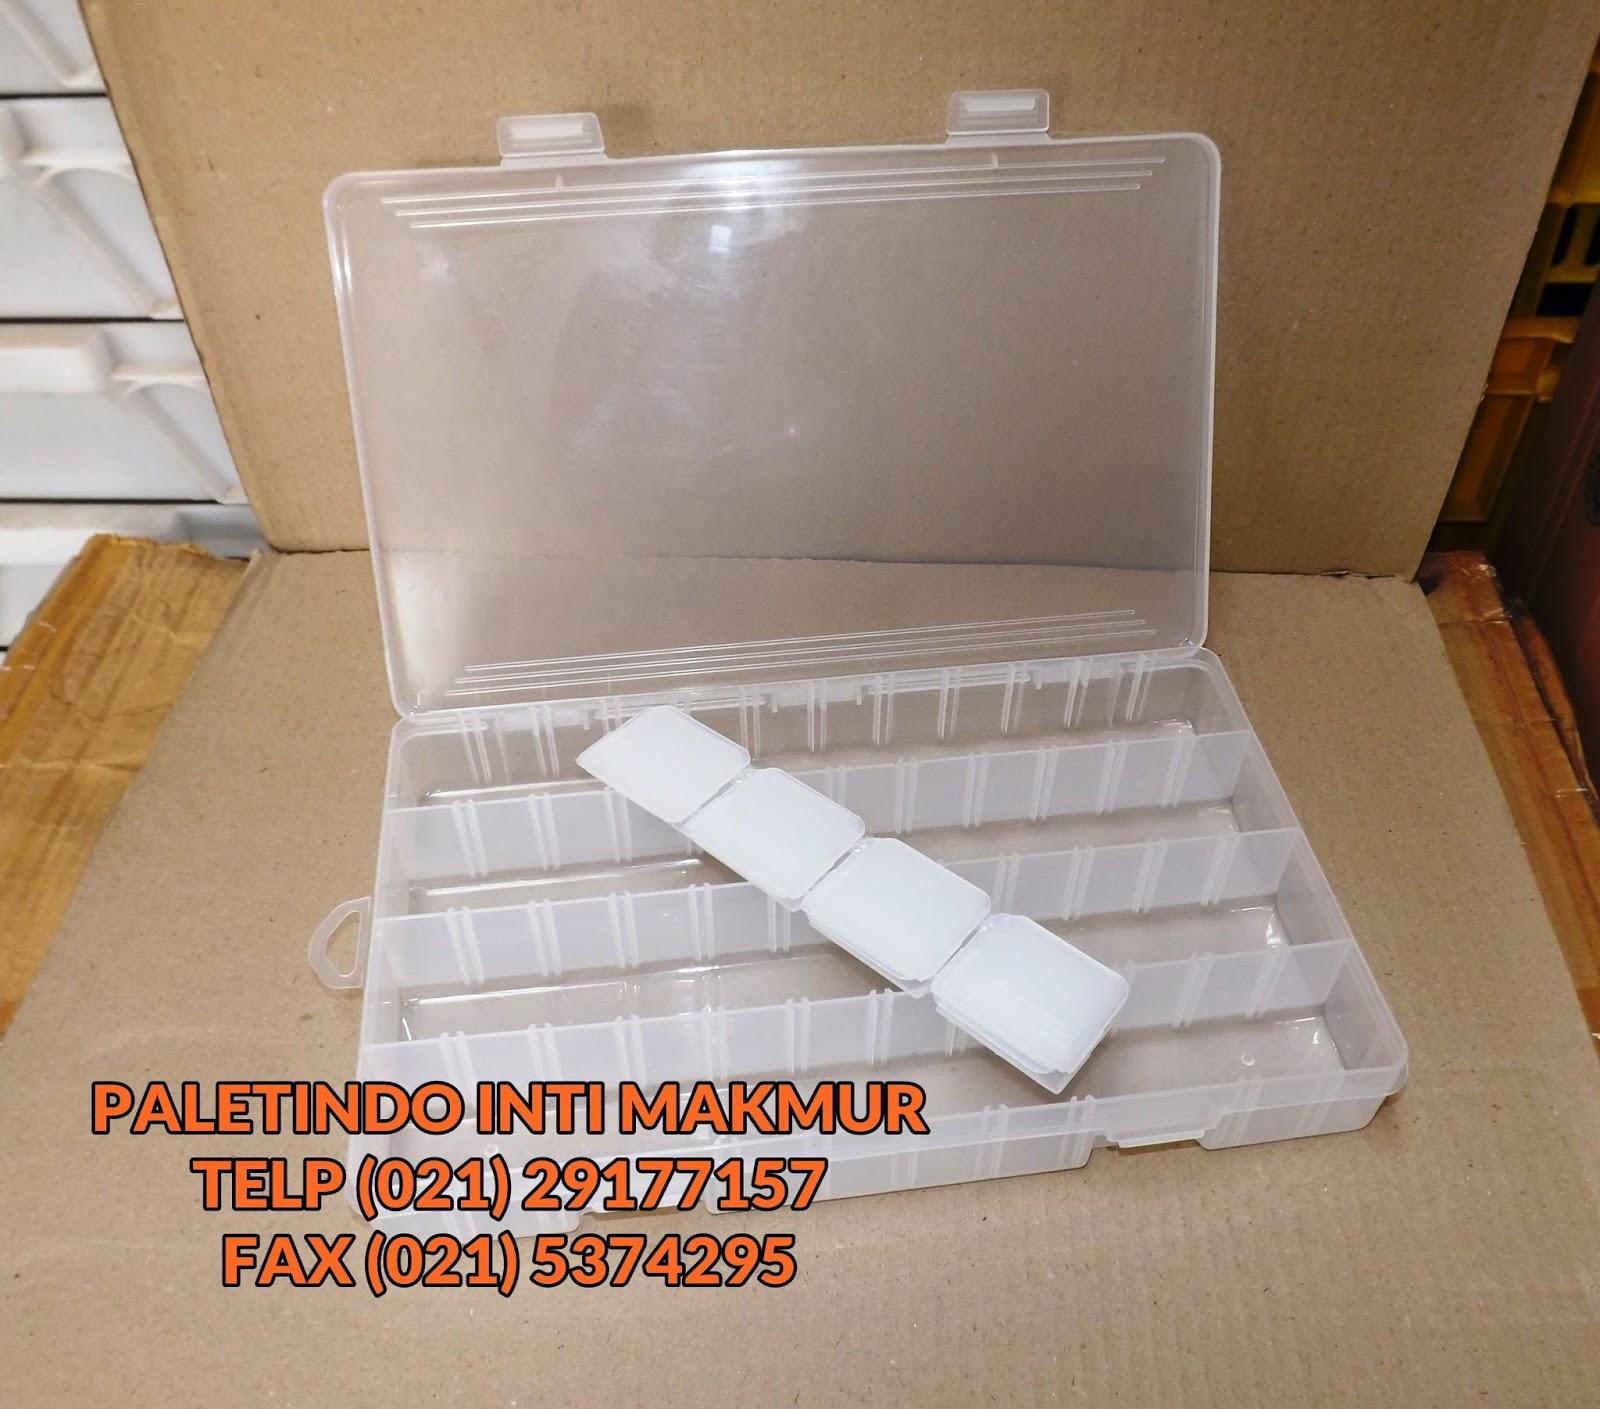 Cv Paletindo Inti Makmur Part Case Tempat Baut Mur Spare Untuk Penyimpanan Seperti Ring Elektronik Mekanik